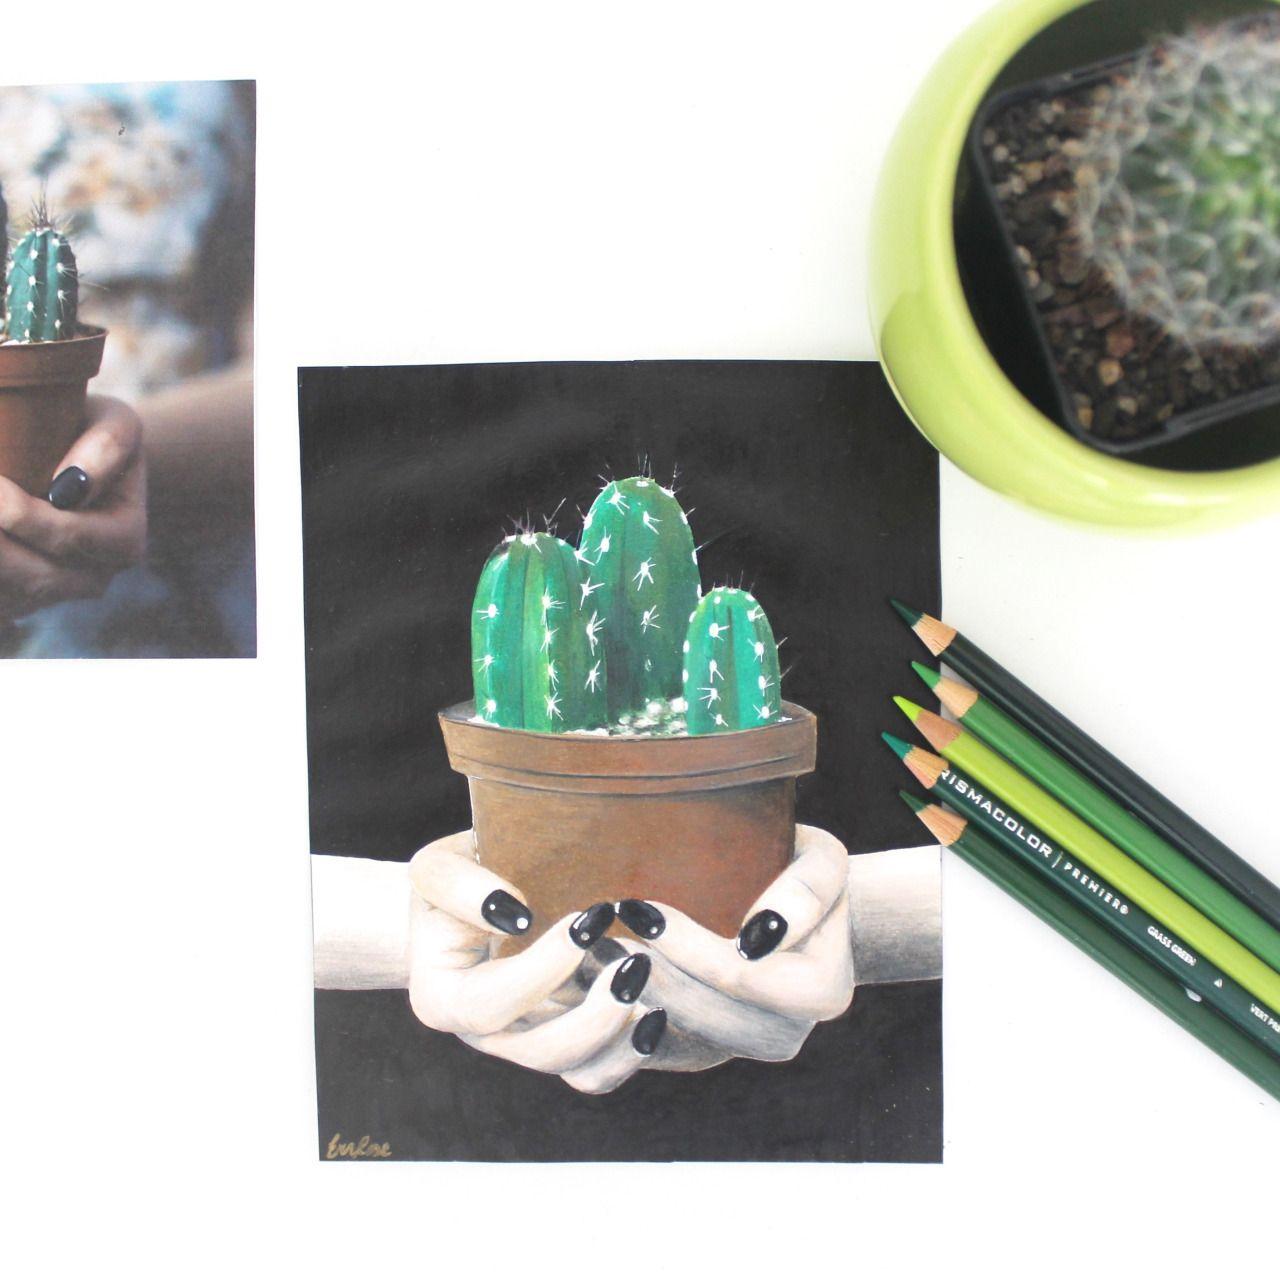 Cactus drawing. More info: https://www.instagram.com/p/BC3t1Z5NBC_/ Blog: http://bobblegary.blogspot.com.au/